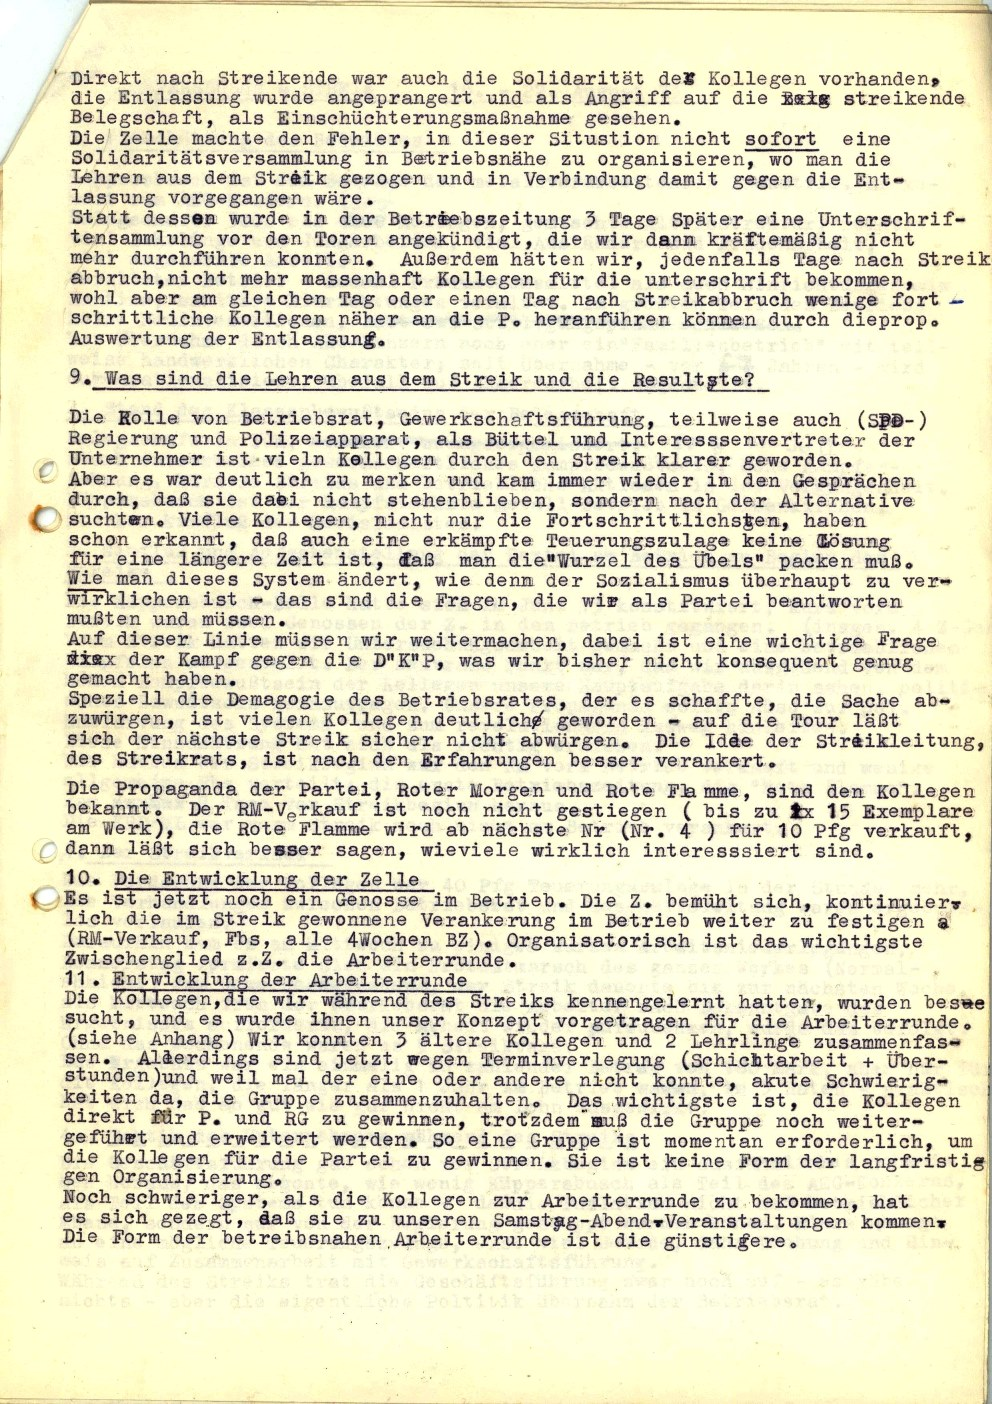 Streikbericht_KPD_ML_1973_04